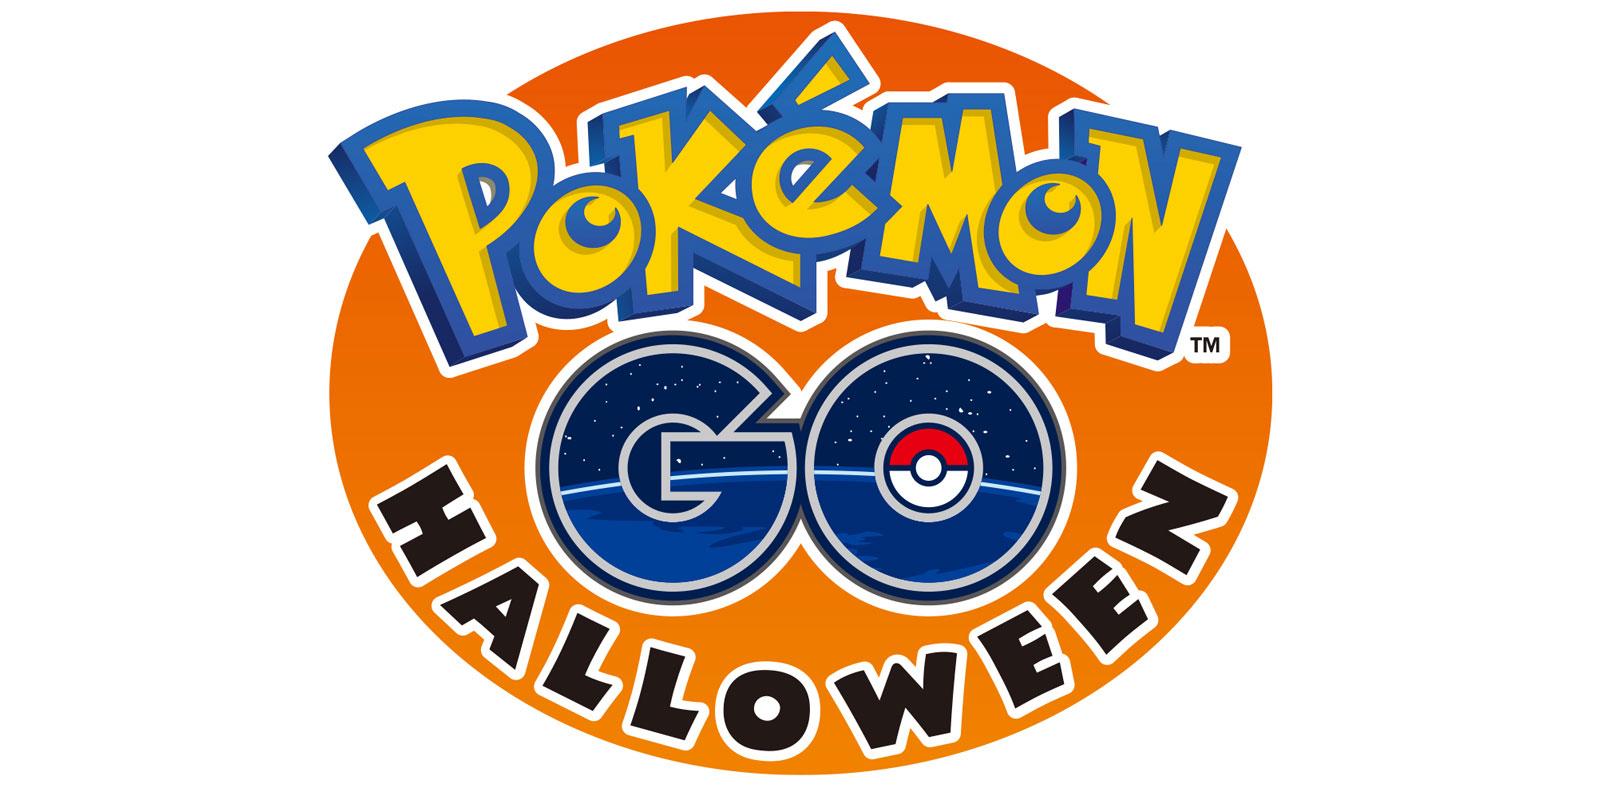 Pokémon Go' offering spooky bonuses for Halloween